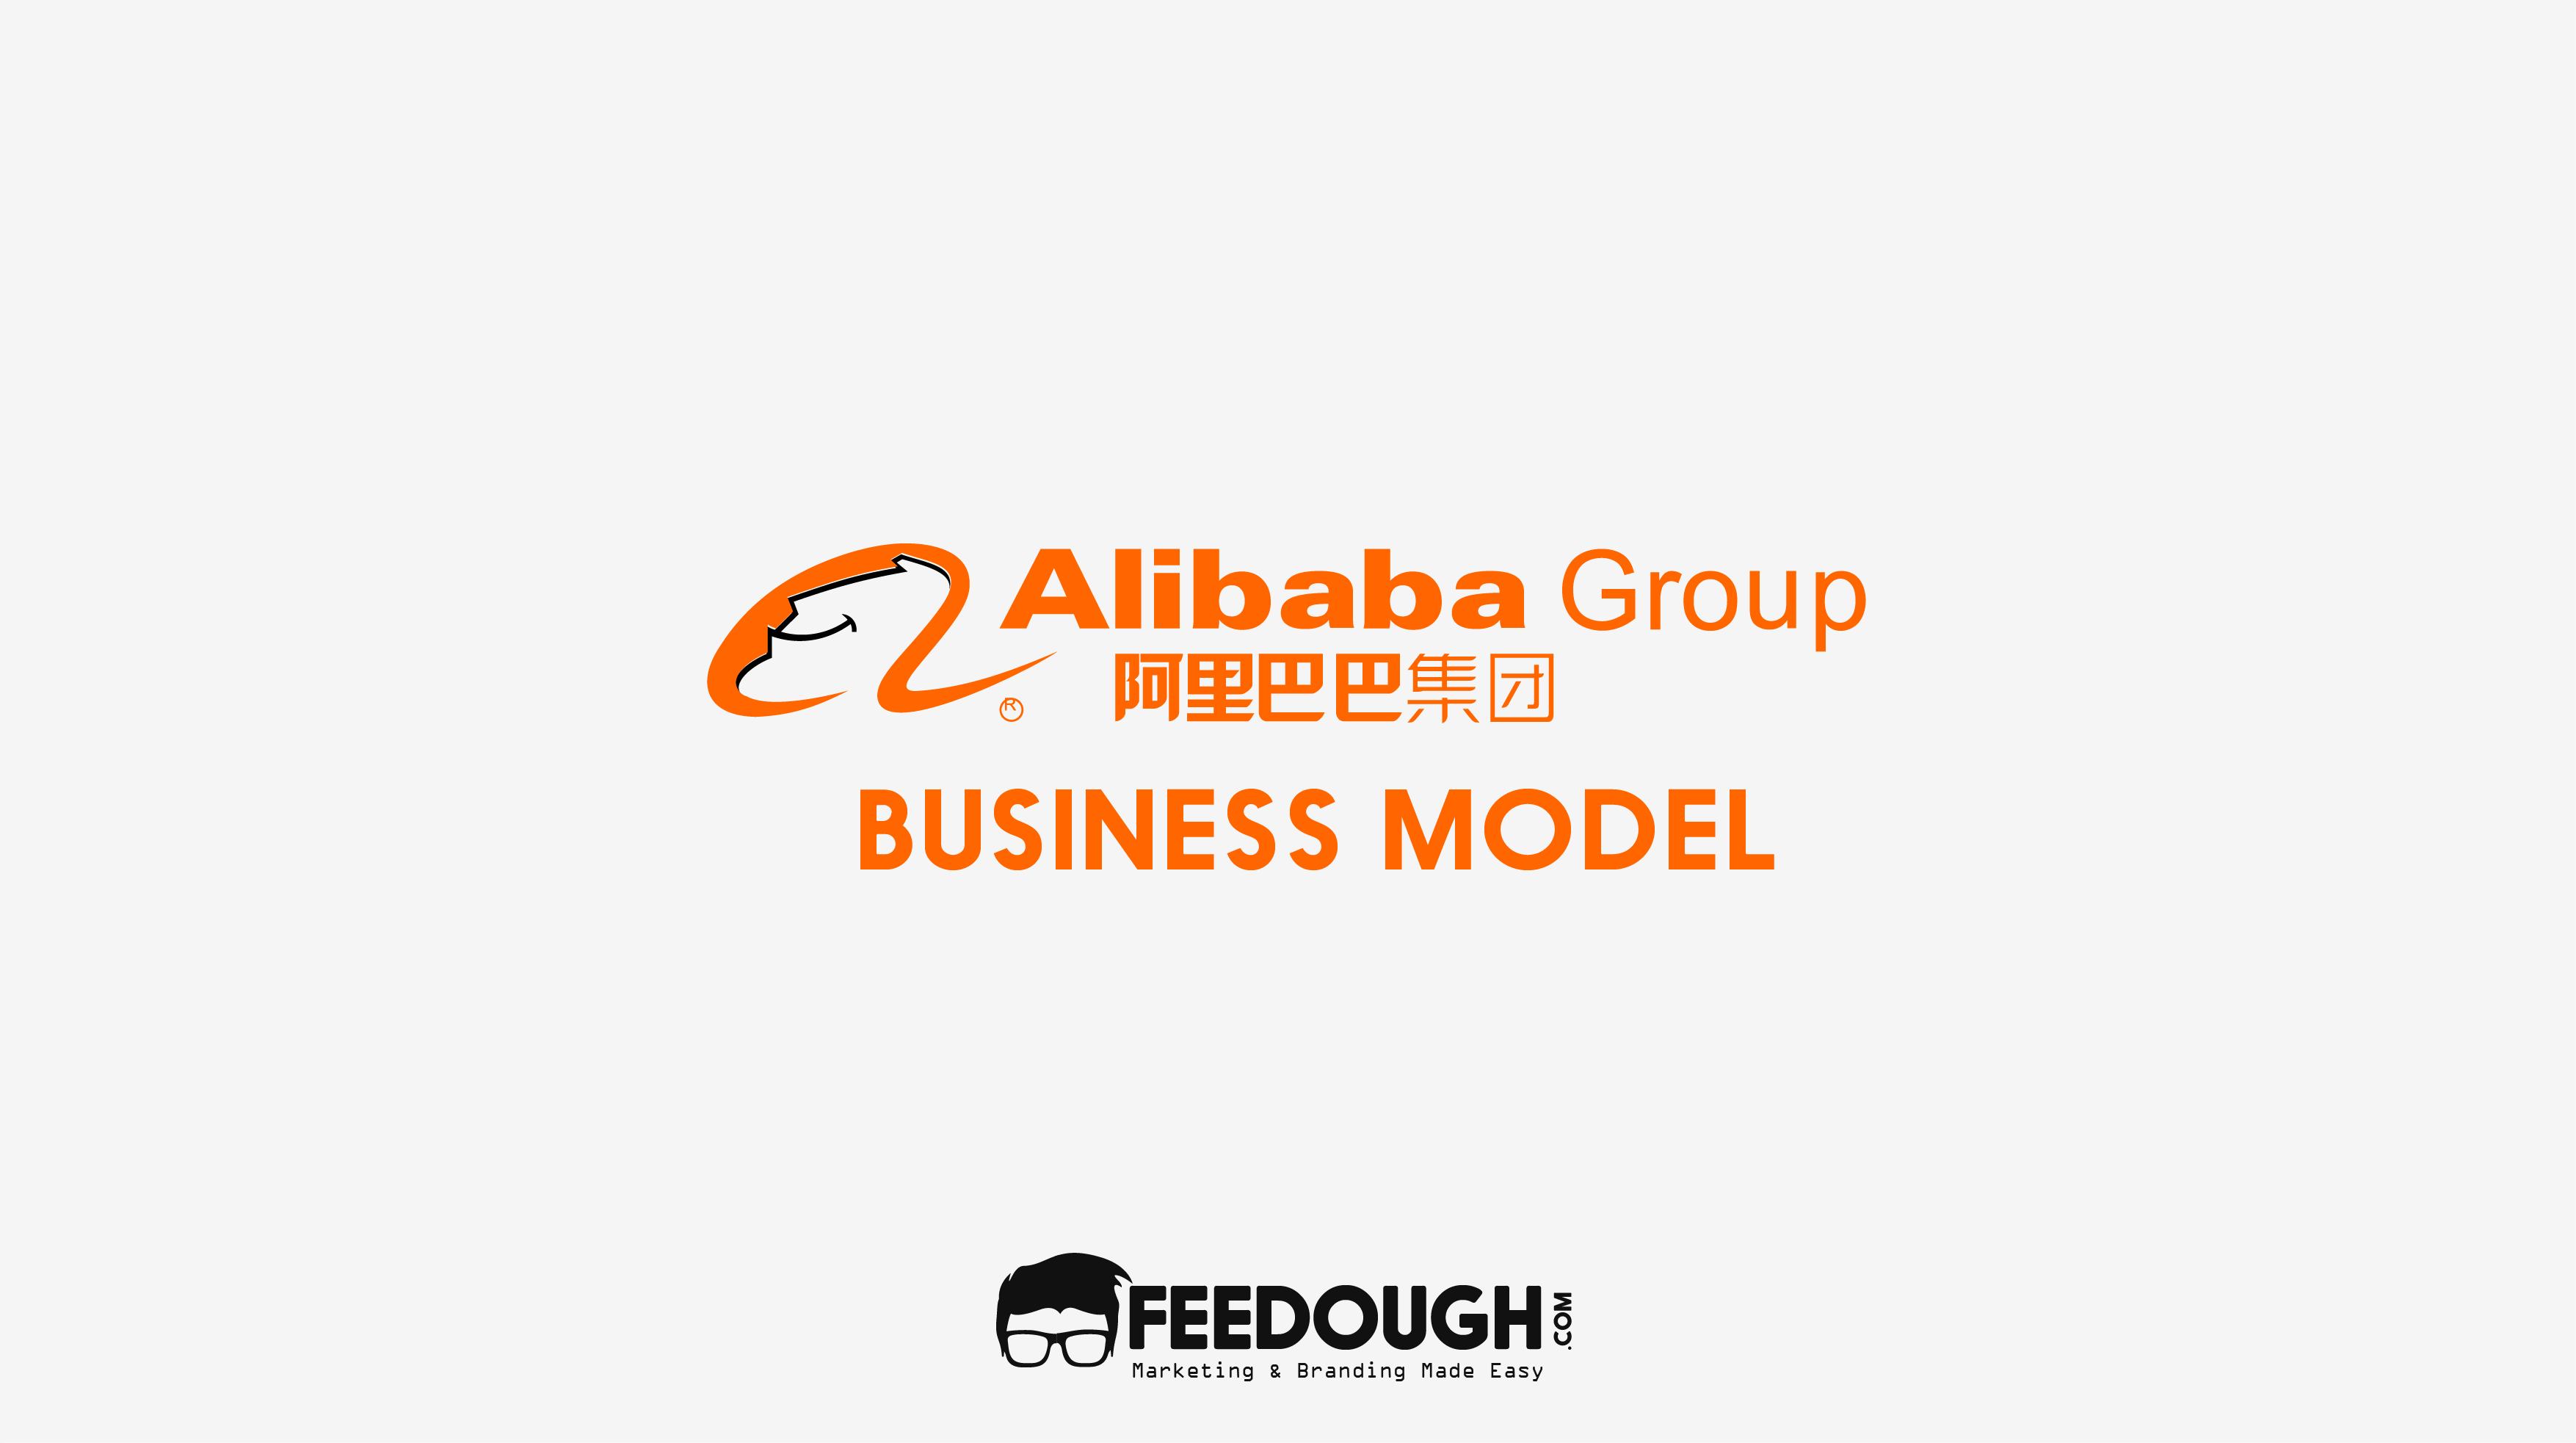 How Does ALIBABA Make Money - Alibaba Group PNG